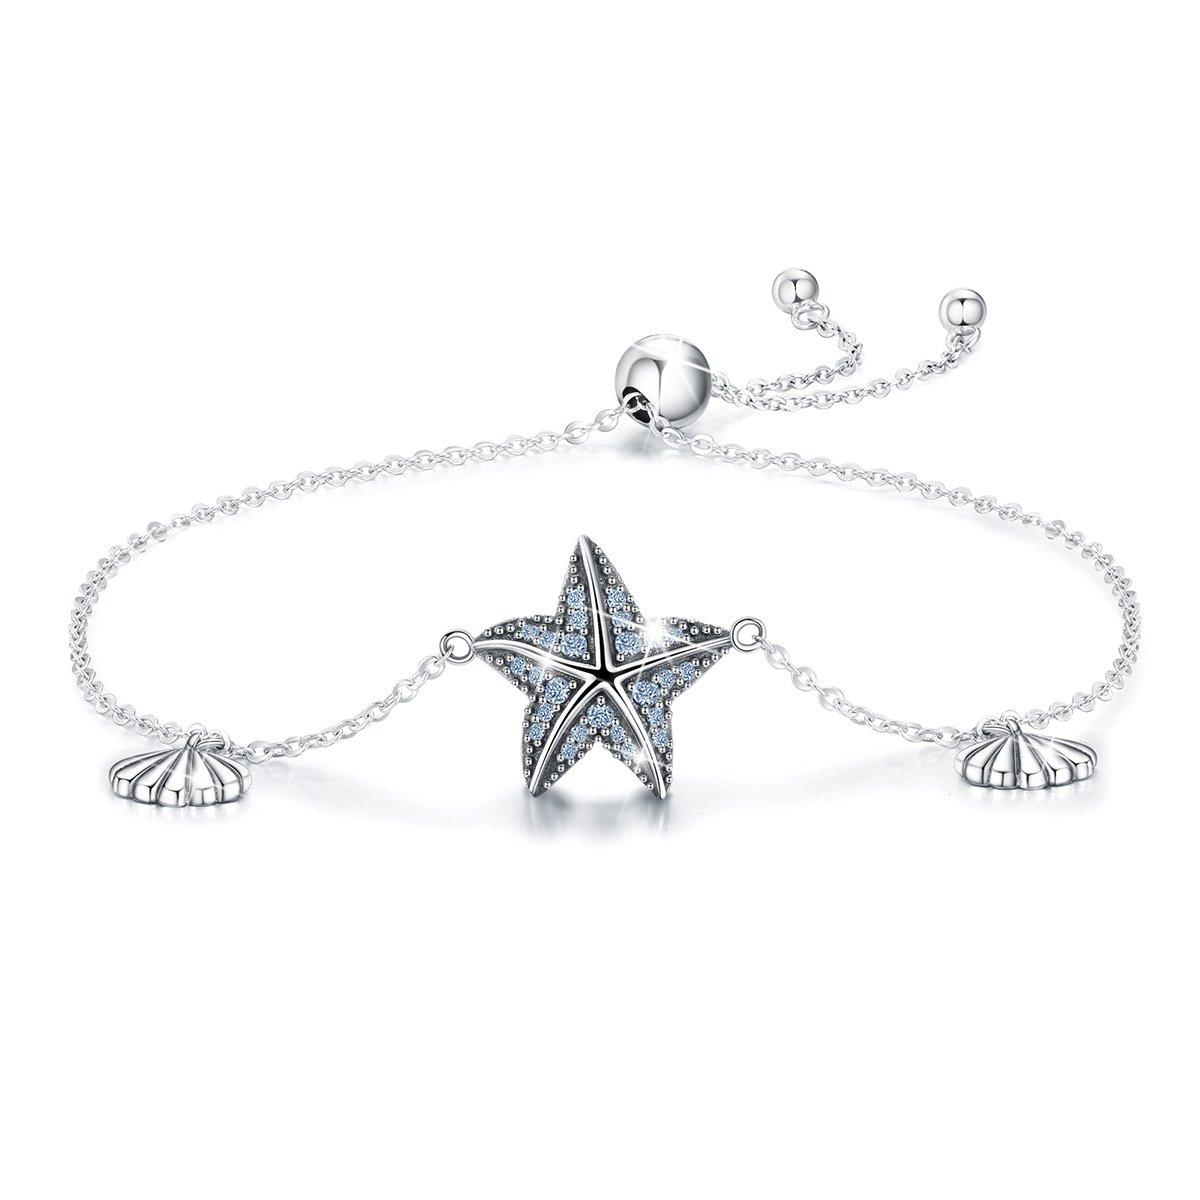 Bamoer Adjustable Sterling Silver Sea Shell Starfish CZ Bracelet